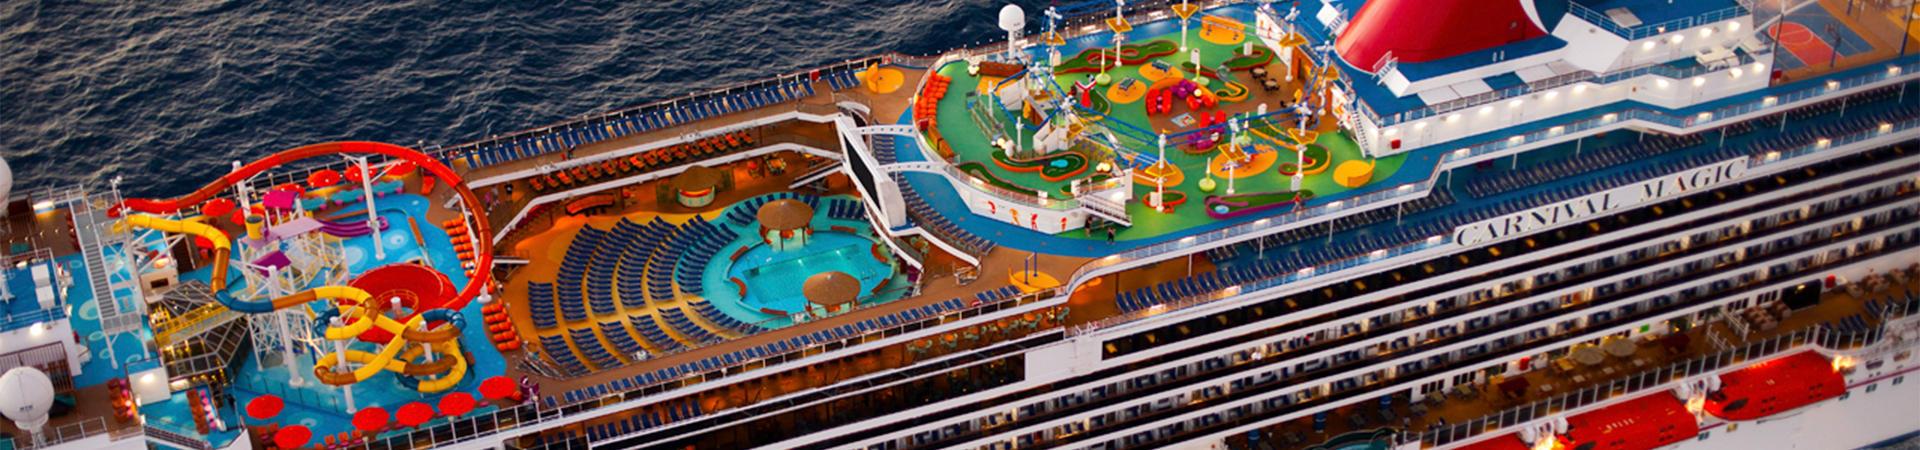 Choose Your Cruise Ship